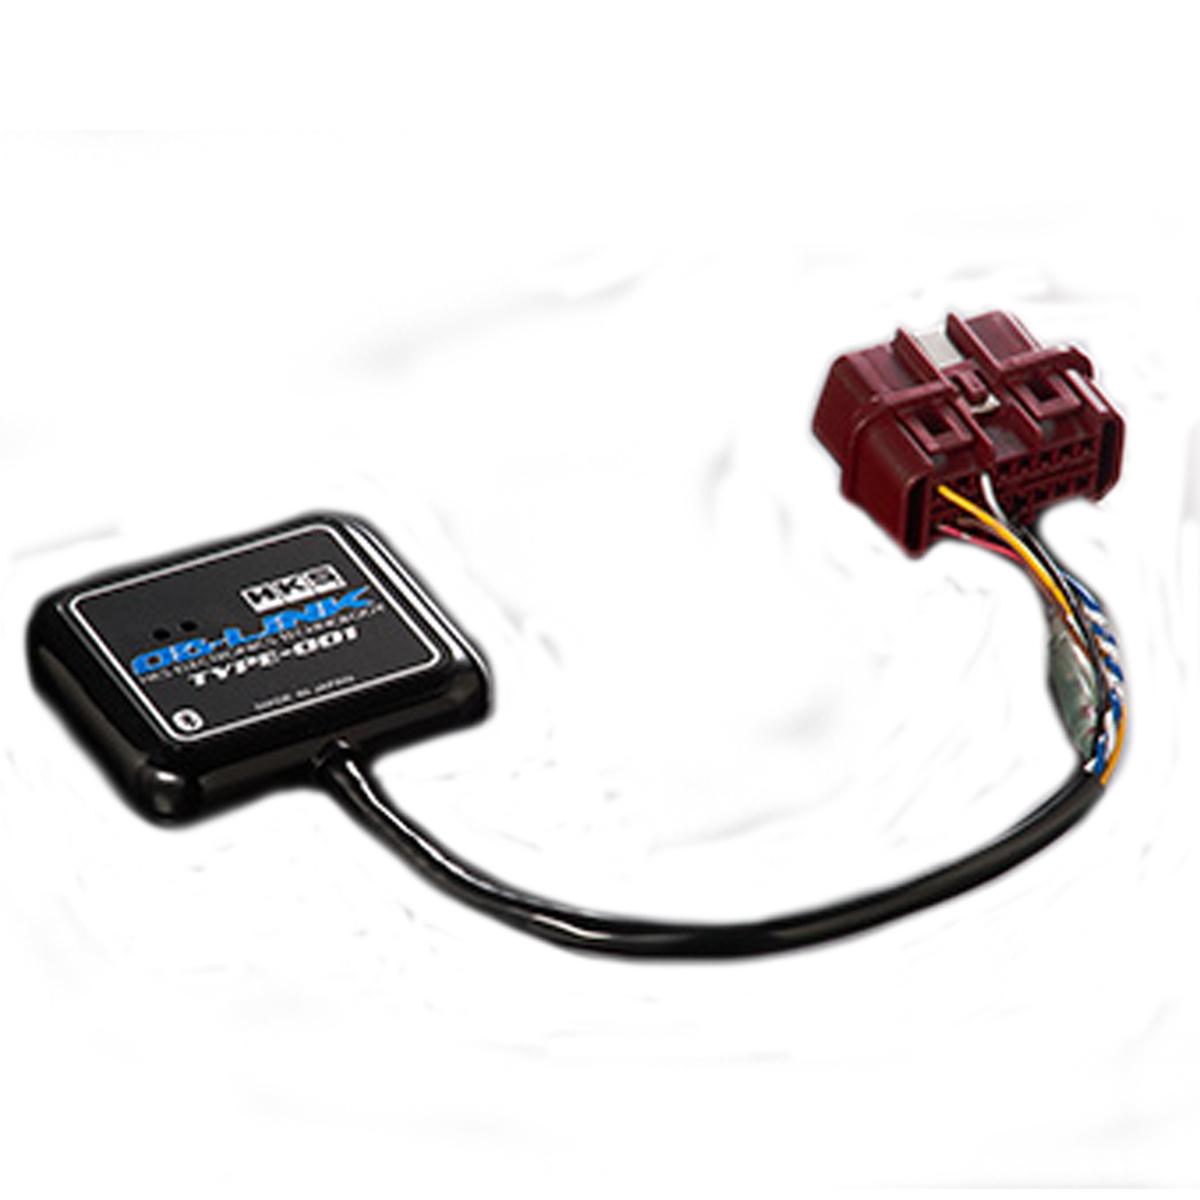 GT-R モニター OBリンク タイプ 001 R35 HKS 44009-AK002 エレクトリニクス 個人宅発送追金有